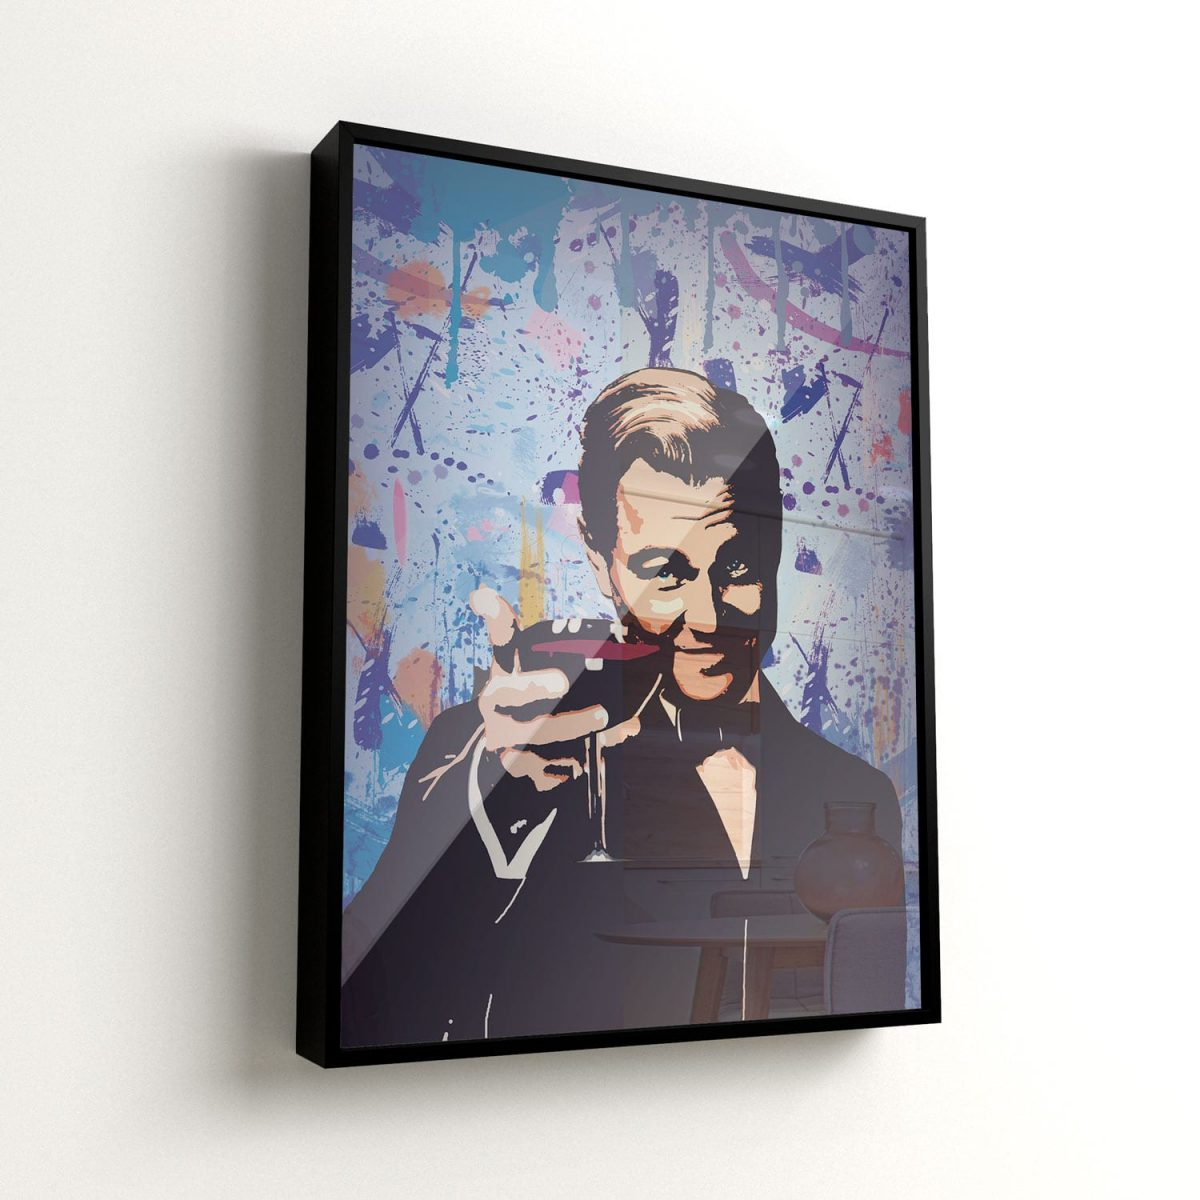 Quadro O Incrível Gatsby vidro